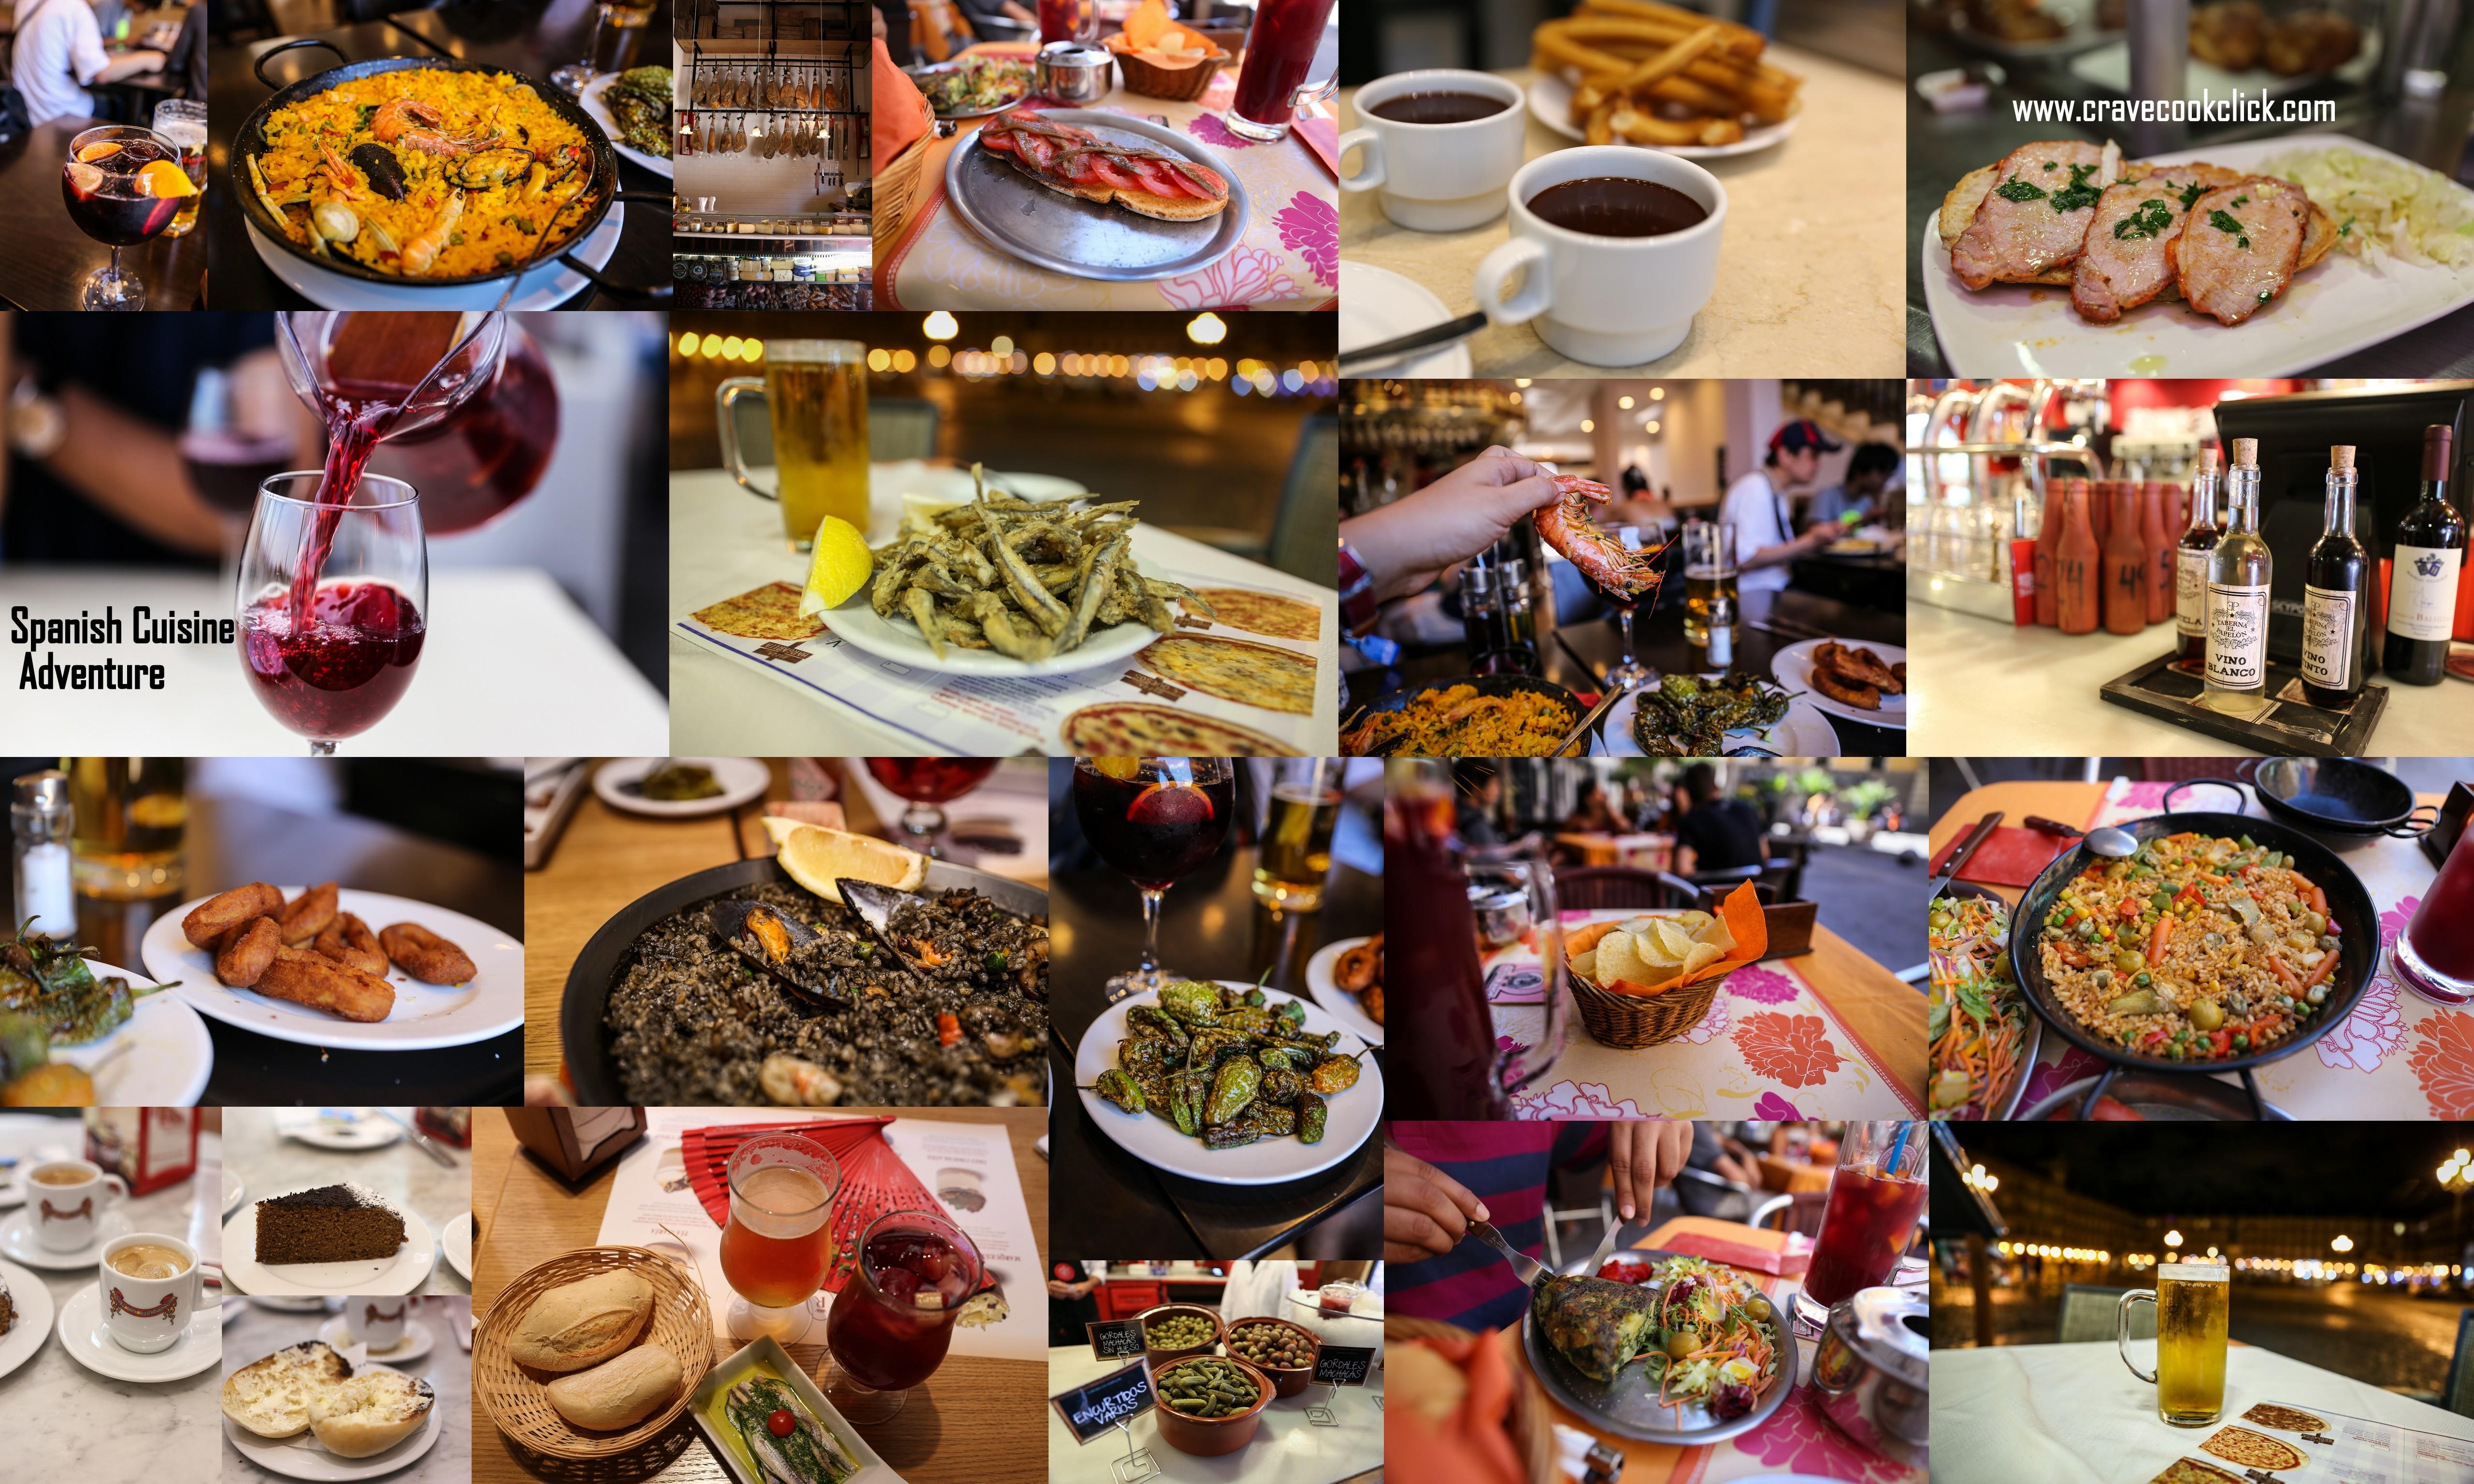 Cocina Española-Spanish Cuisine Adventure